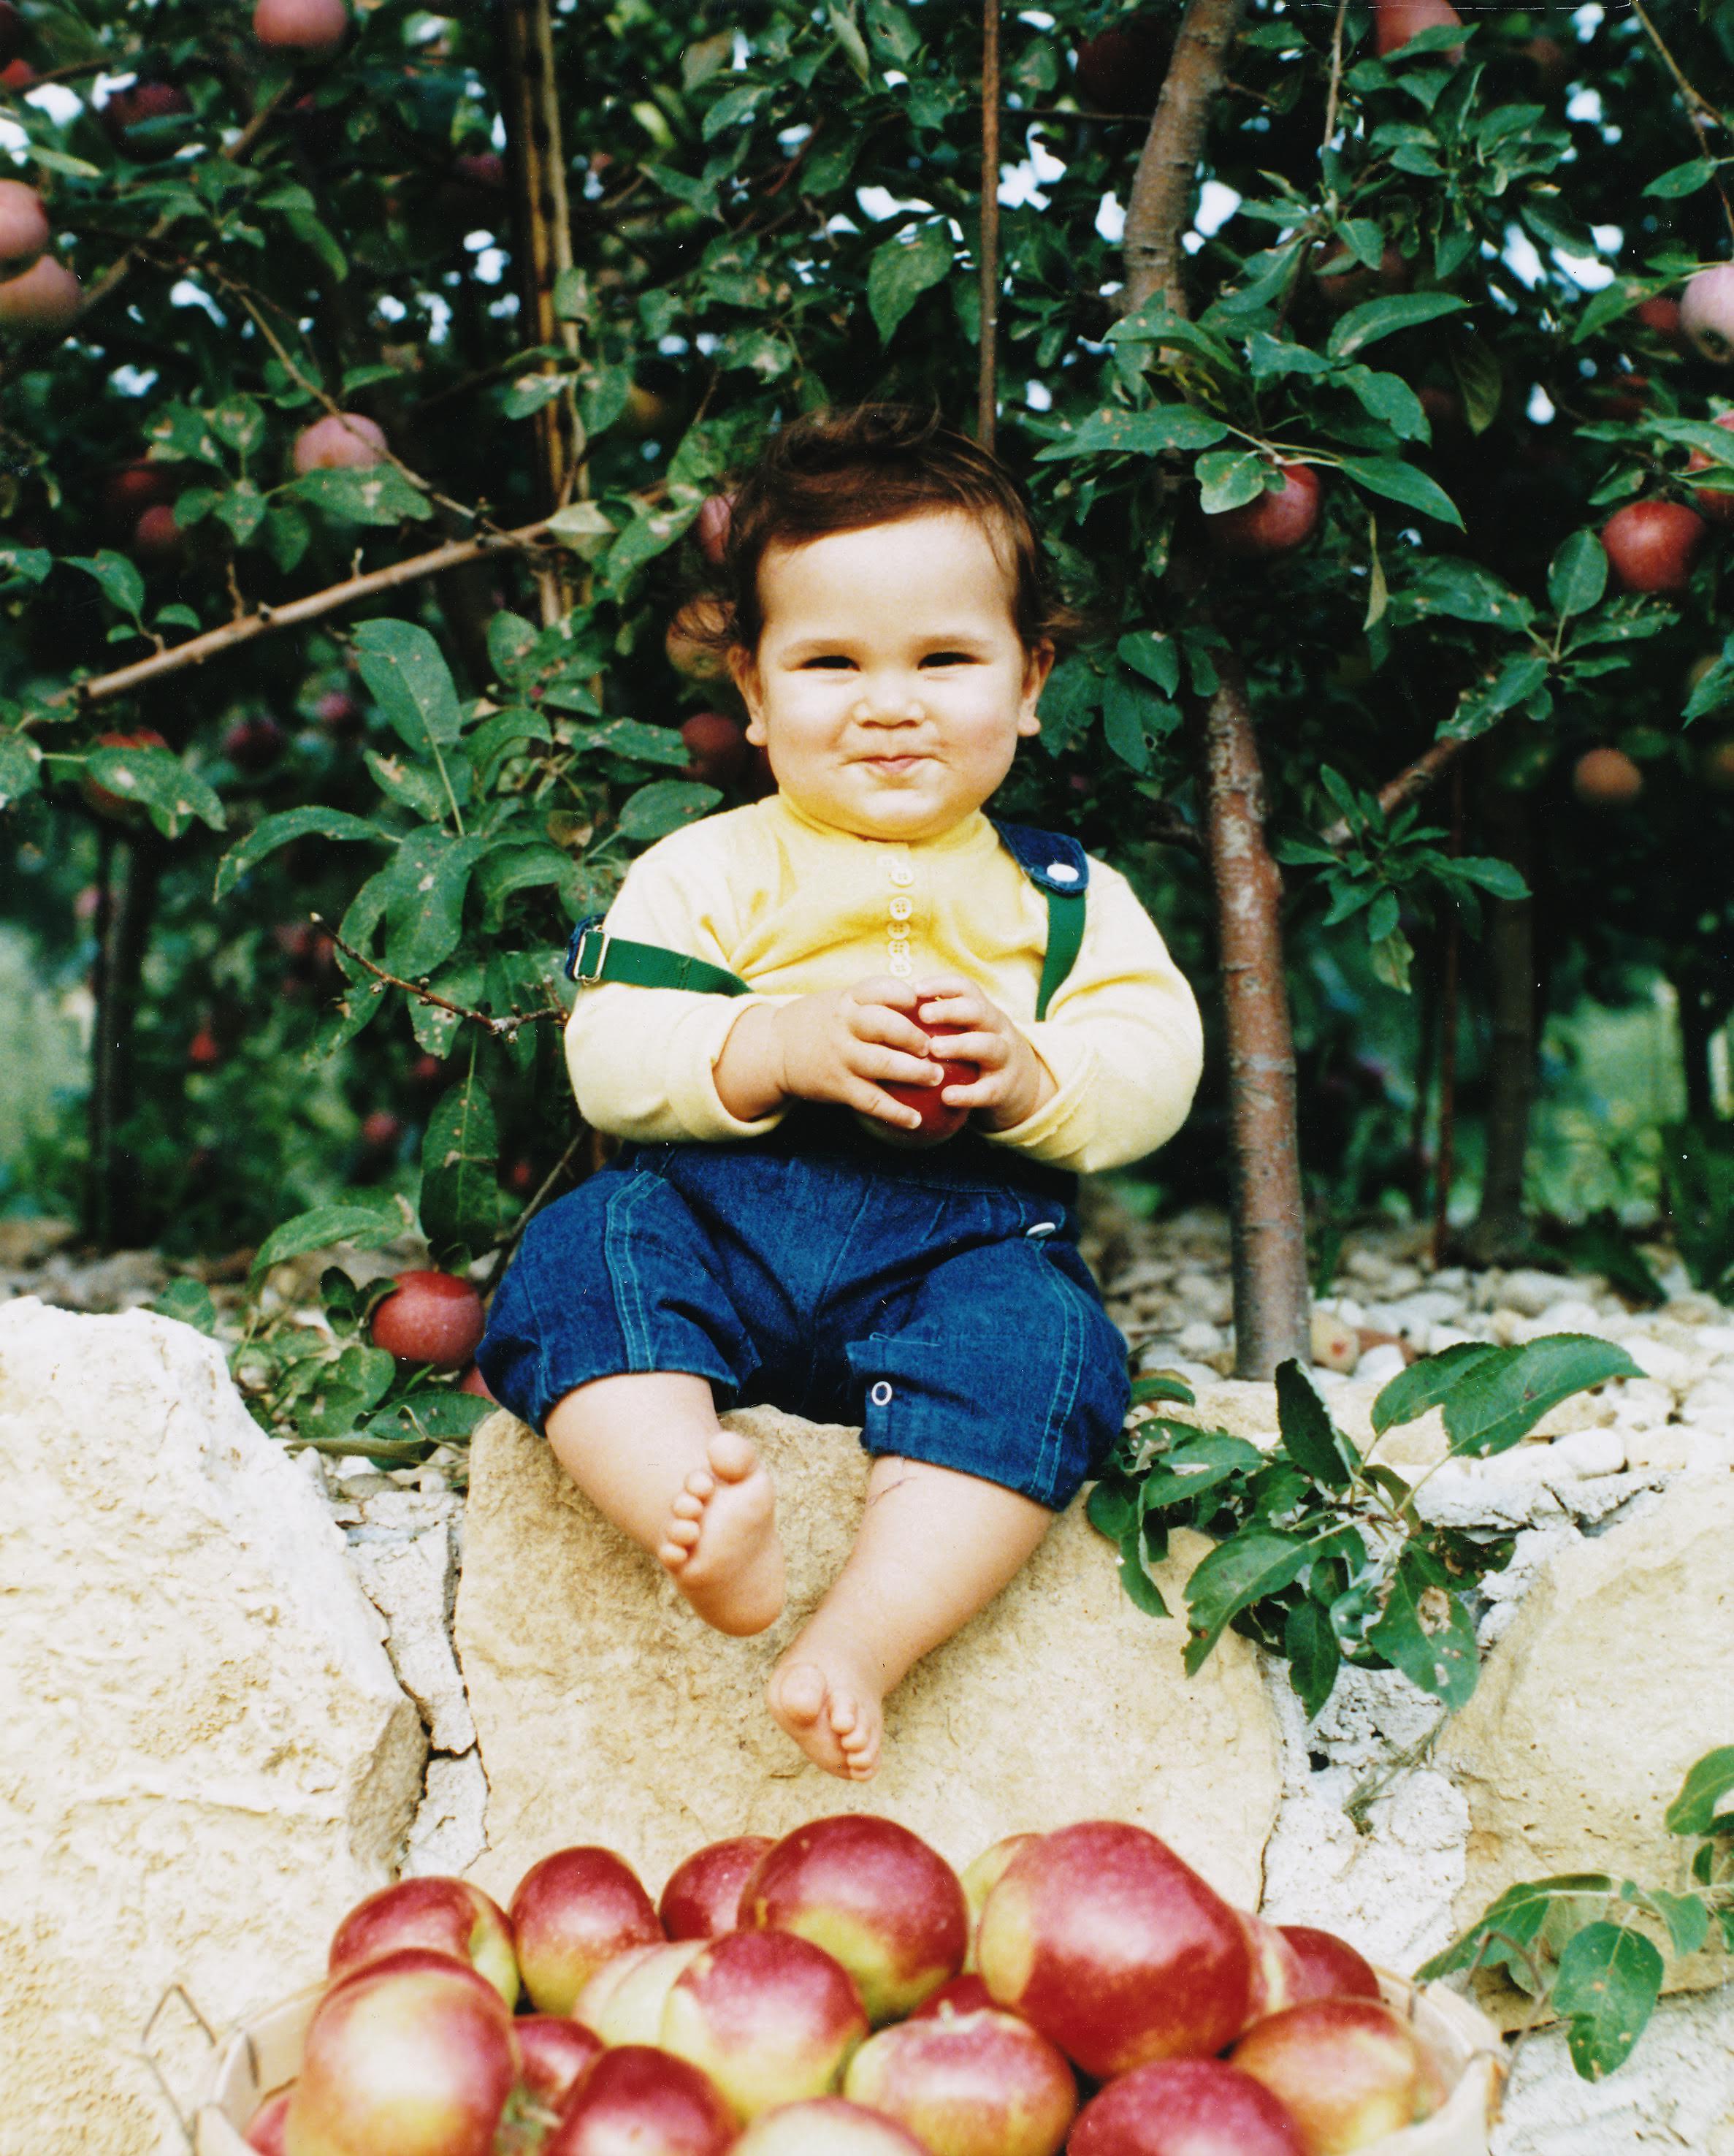 Drew Ten Eyck growing up on the Ten Eyck Orchard